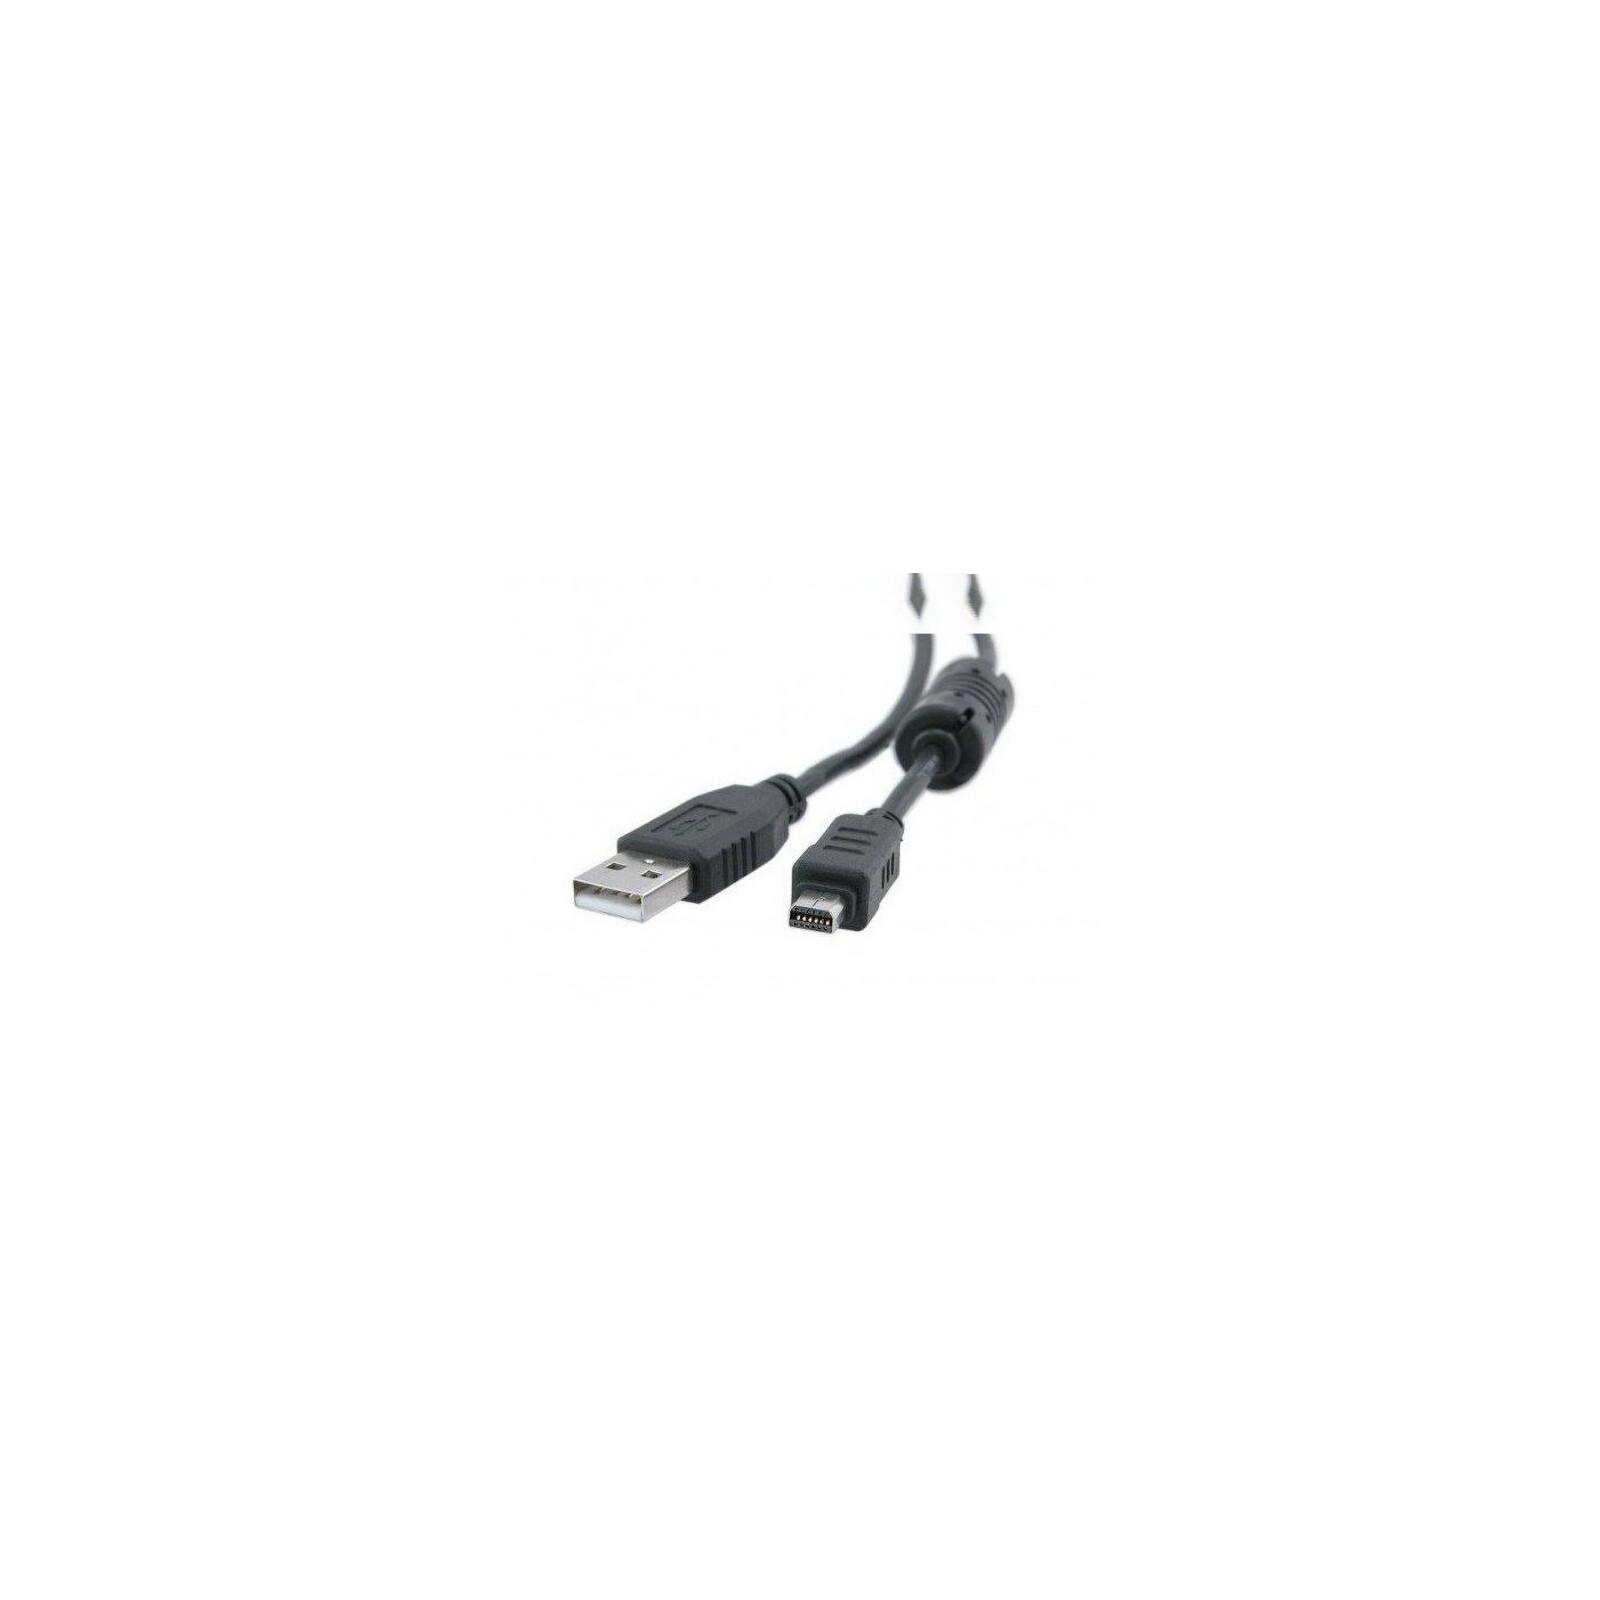 Olympus Original USB-Datenkabel SZ-10/20